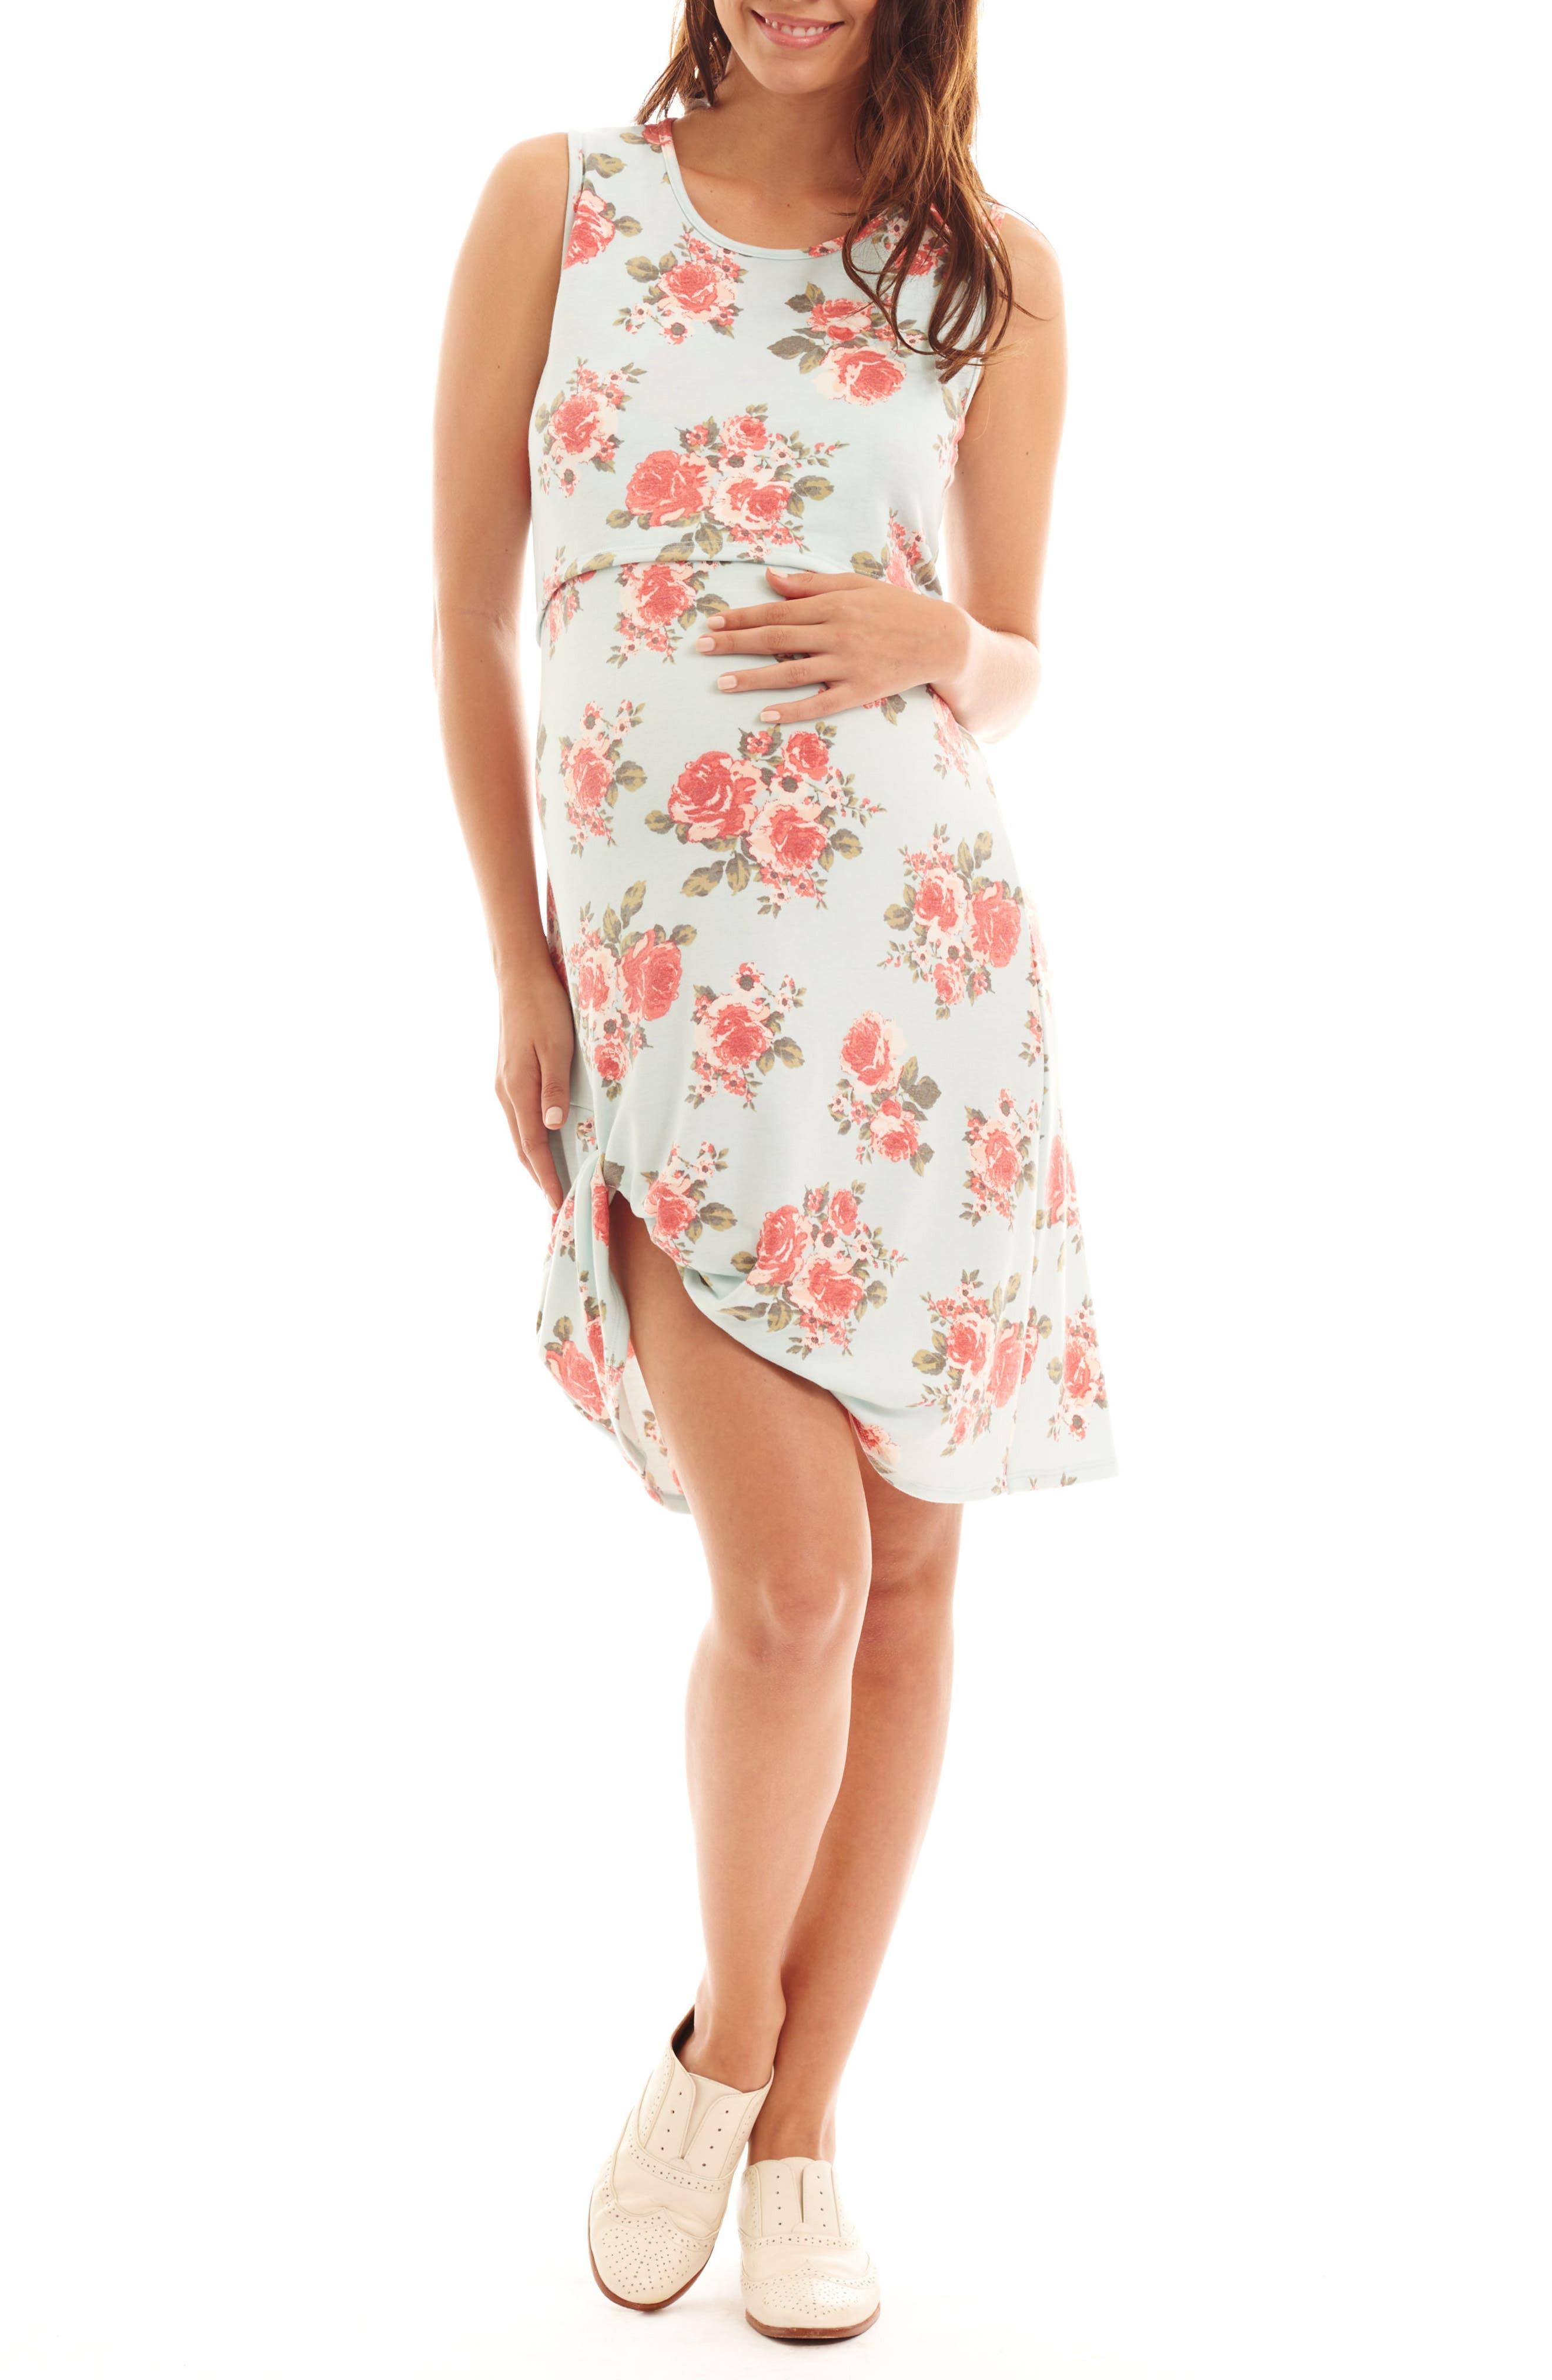 Everly Grey Marta Floral Maternity/nursing Dress